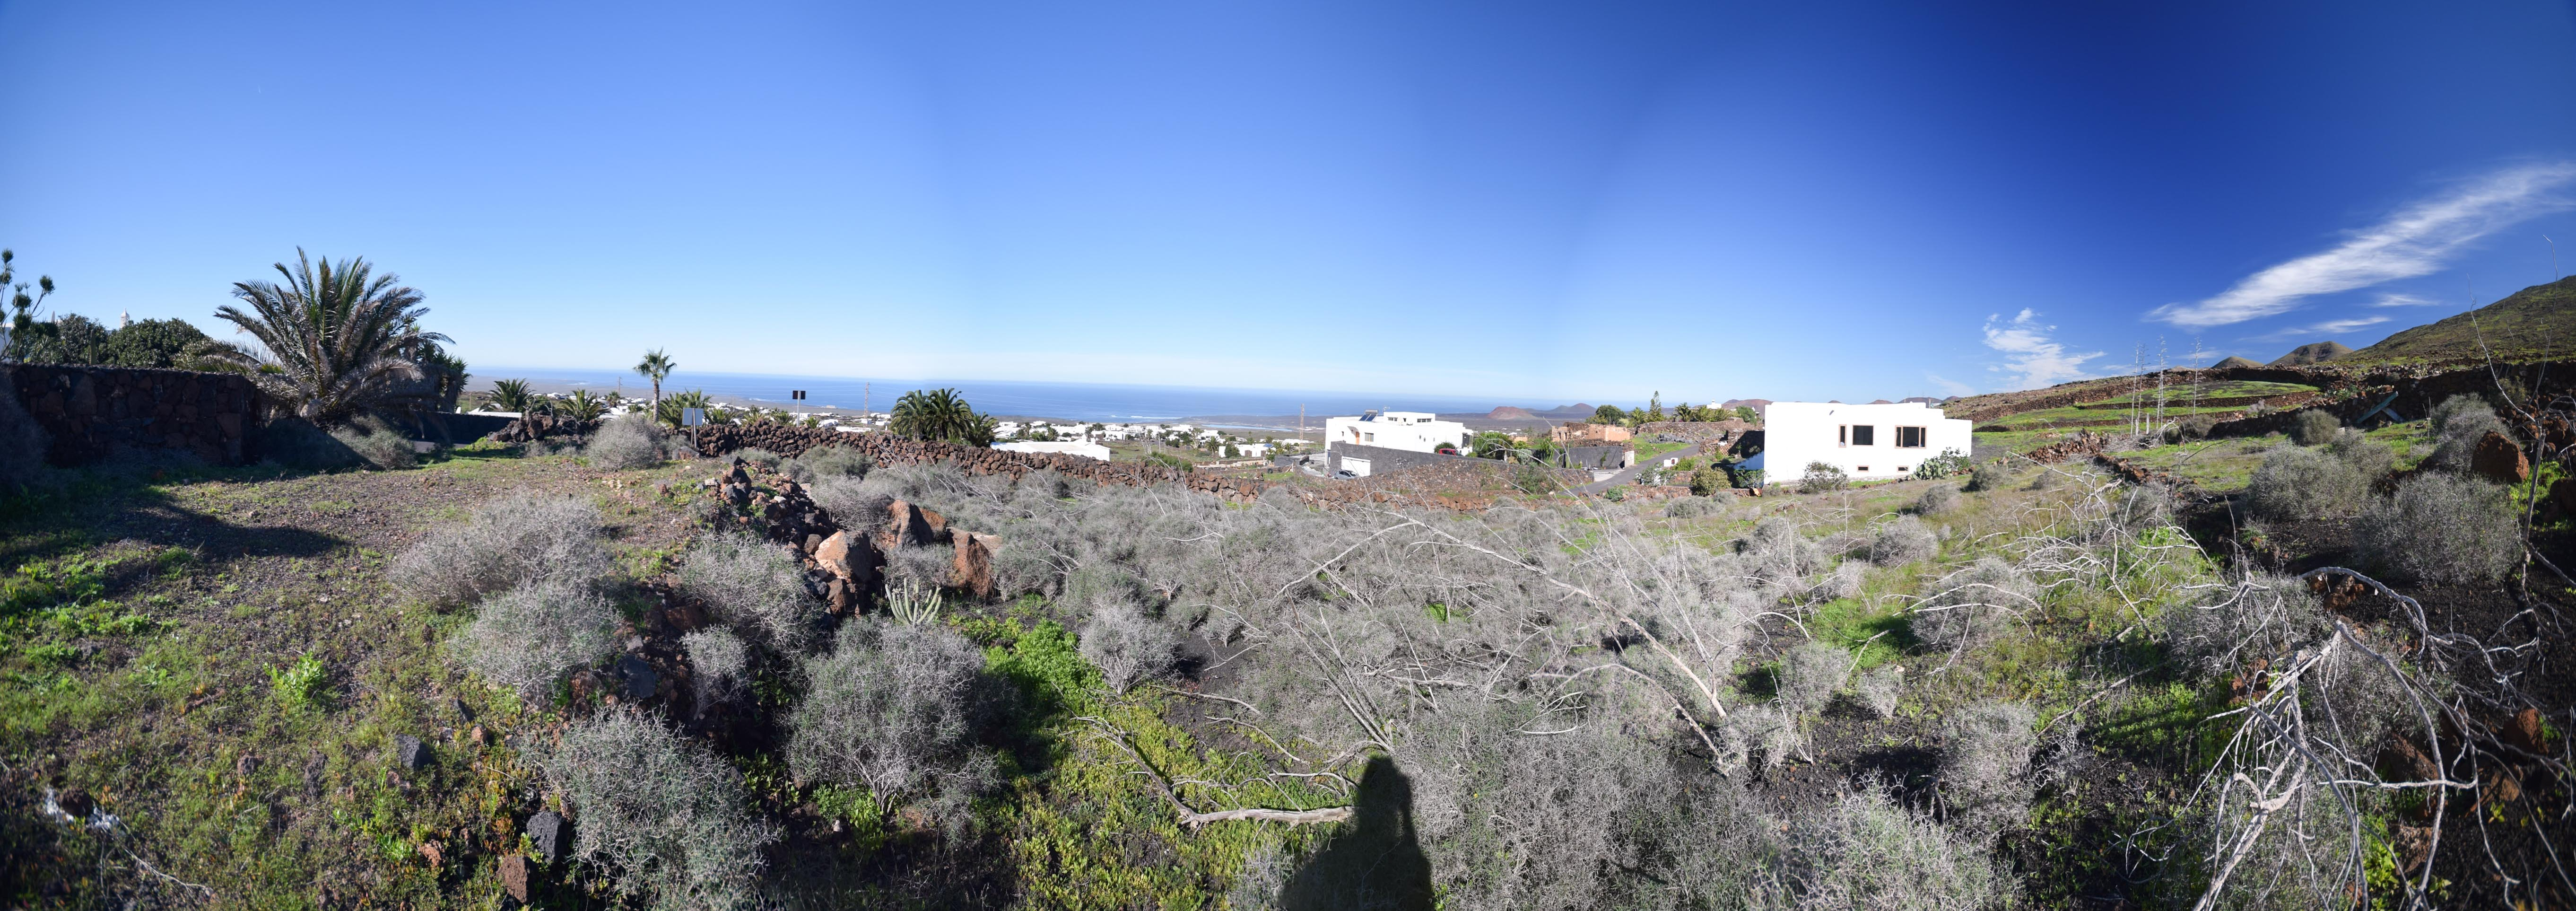 2018 12 LasBrenas December Panorama 003